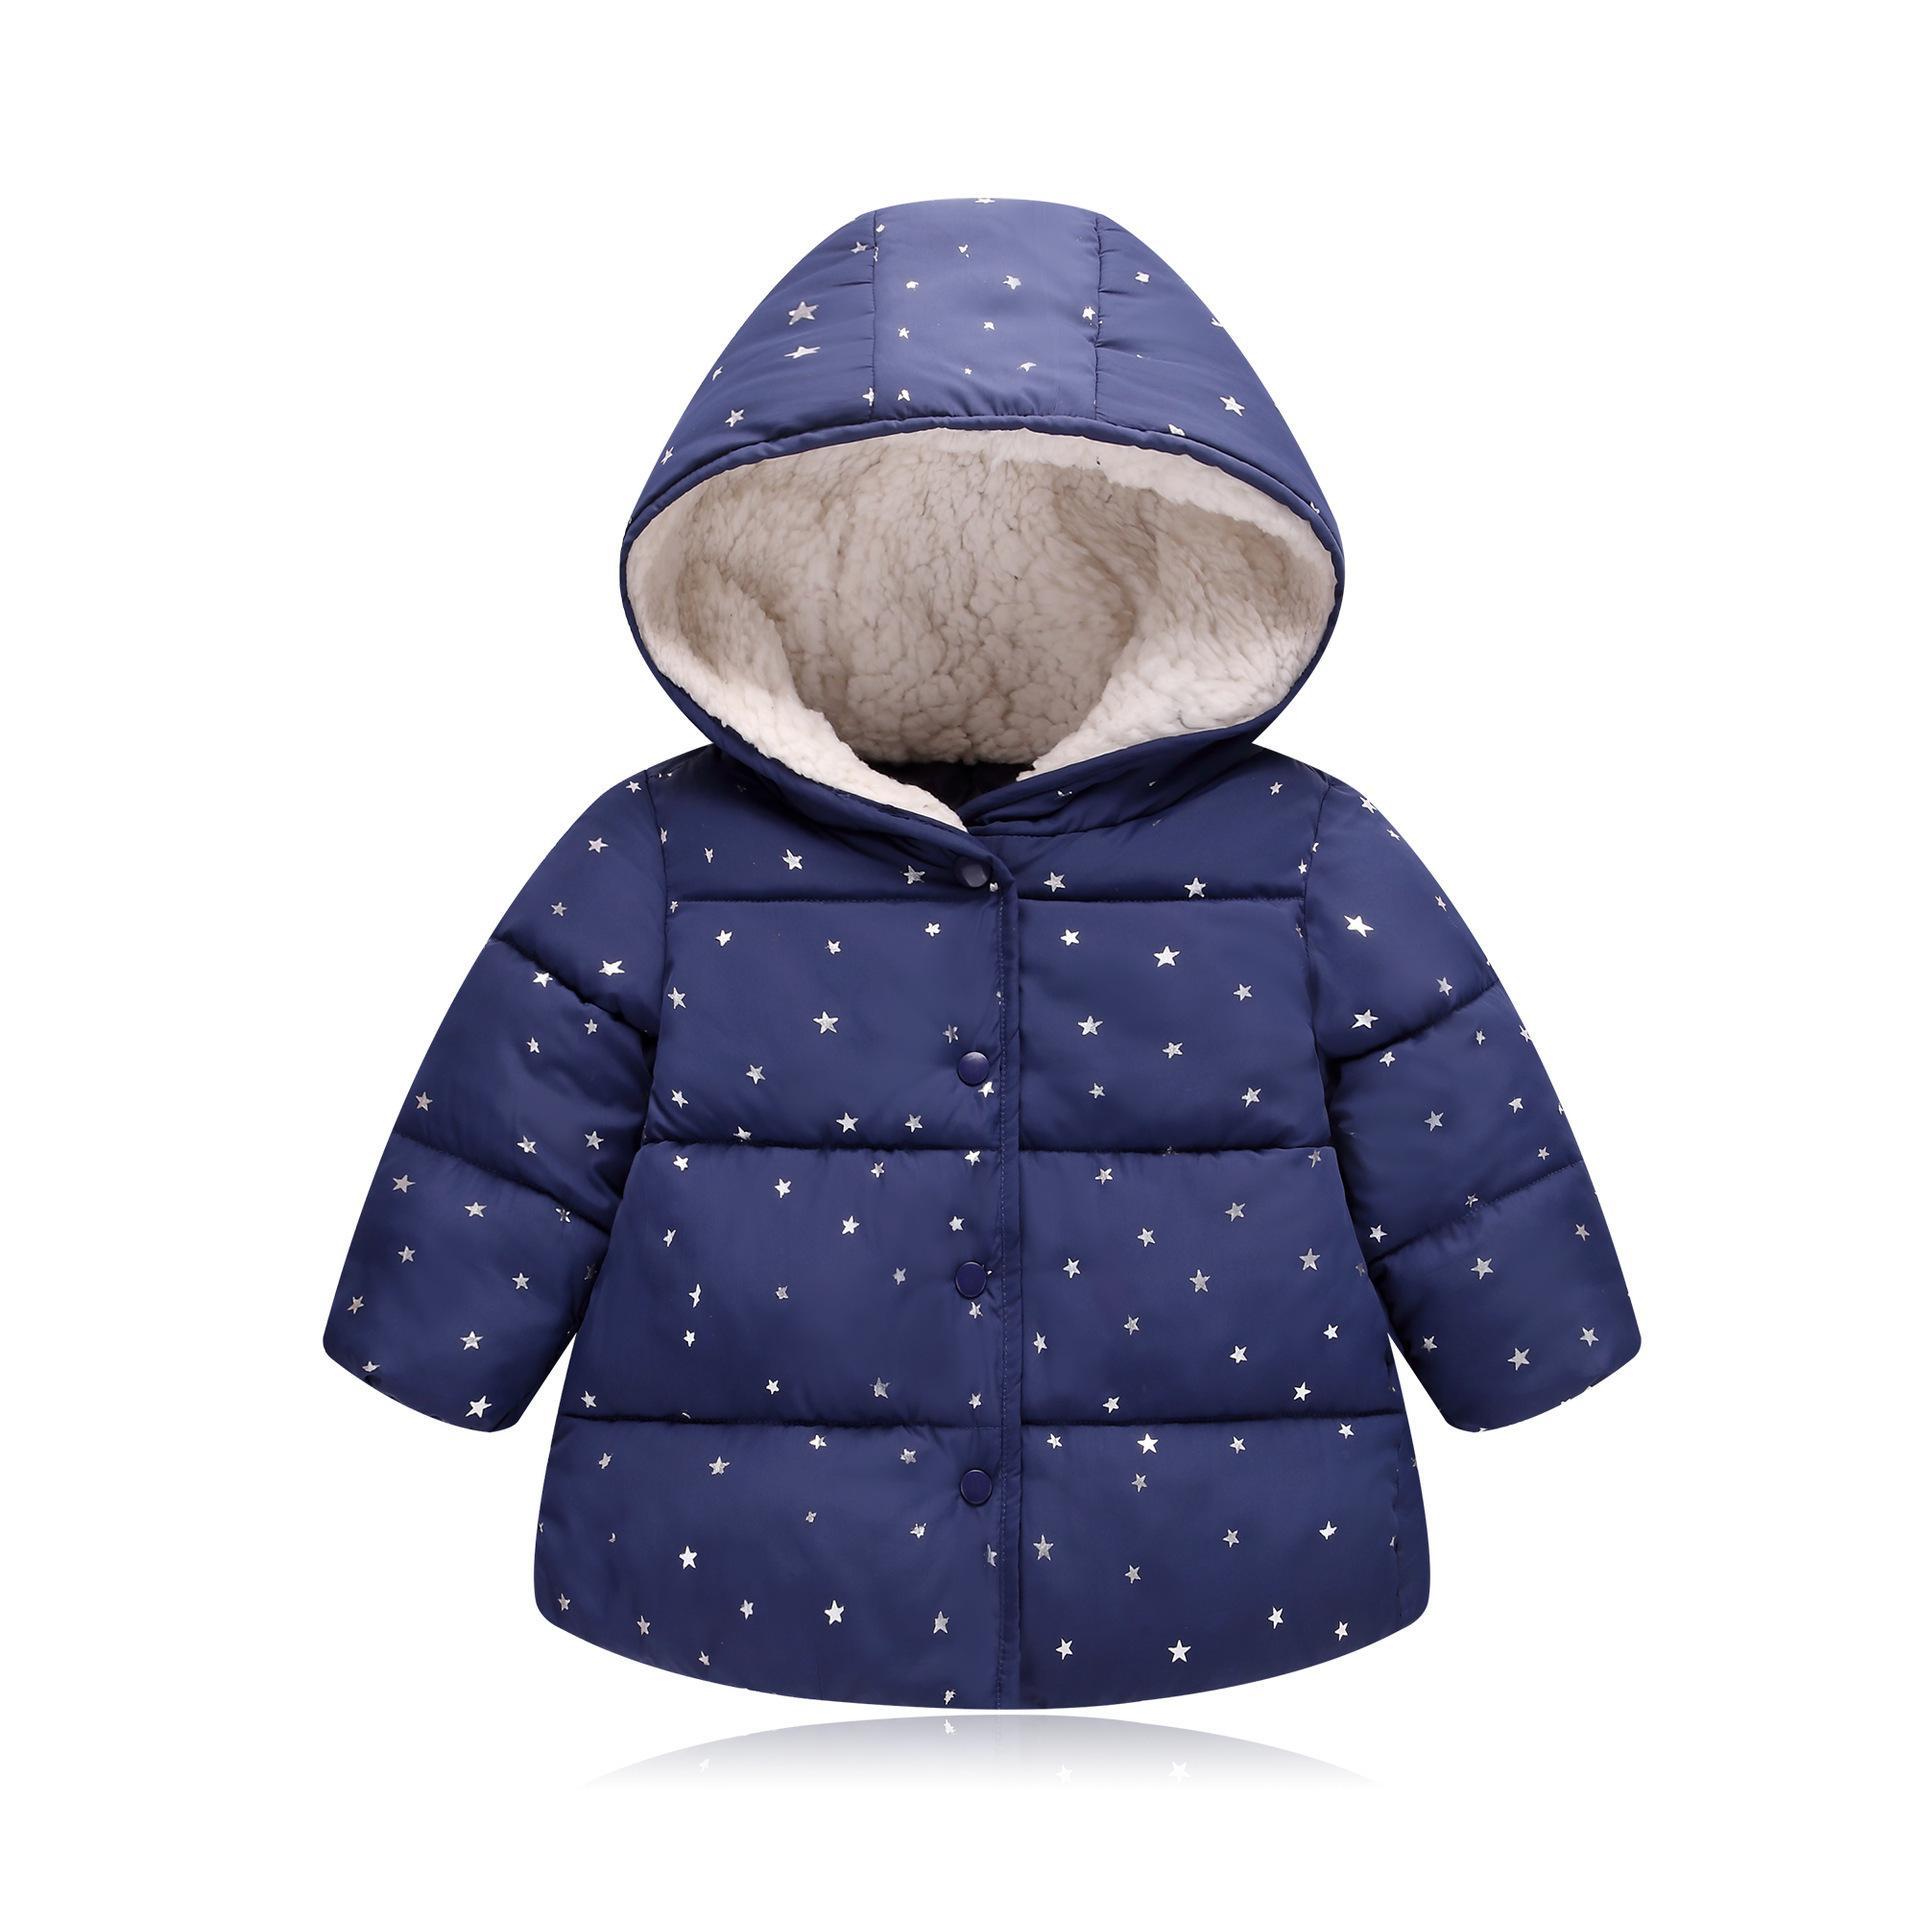 437242c0fab good quality boys winter 2019 jackets cotton hooded down parkas children  boys casual warm sports coats fashion velvet outerwear